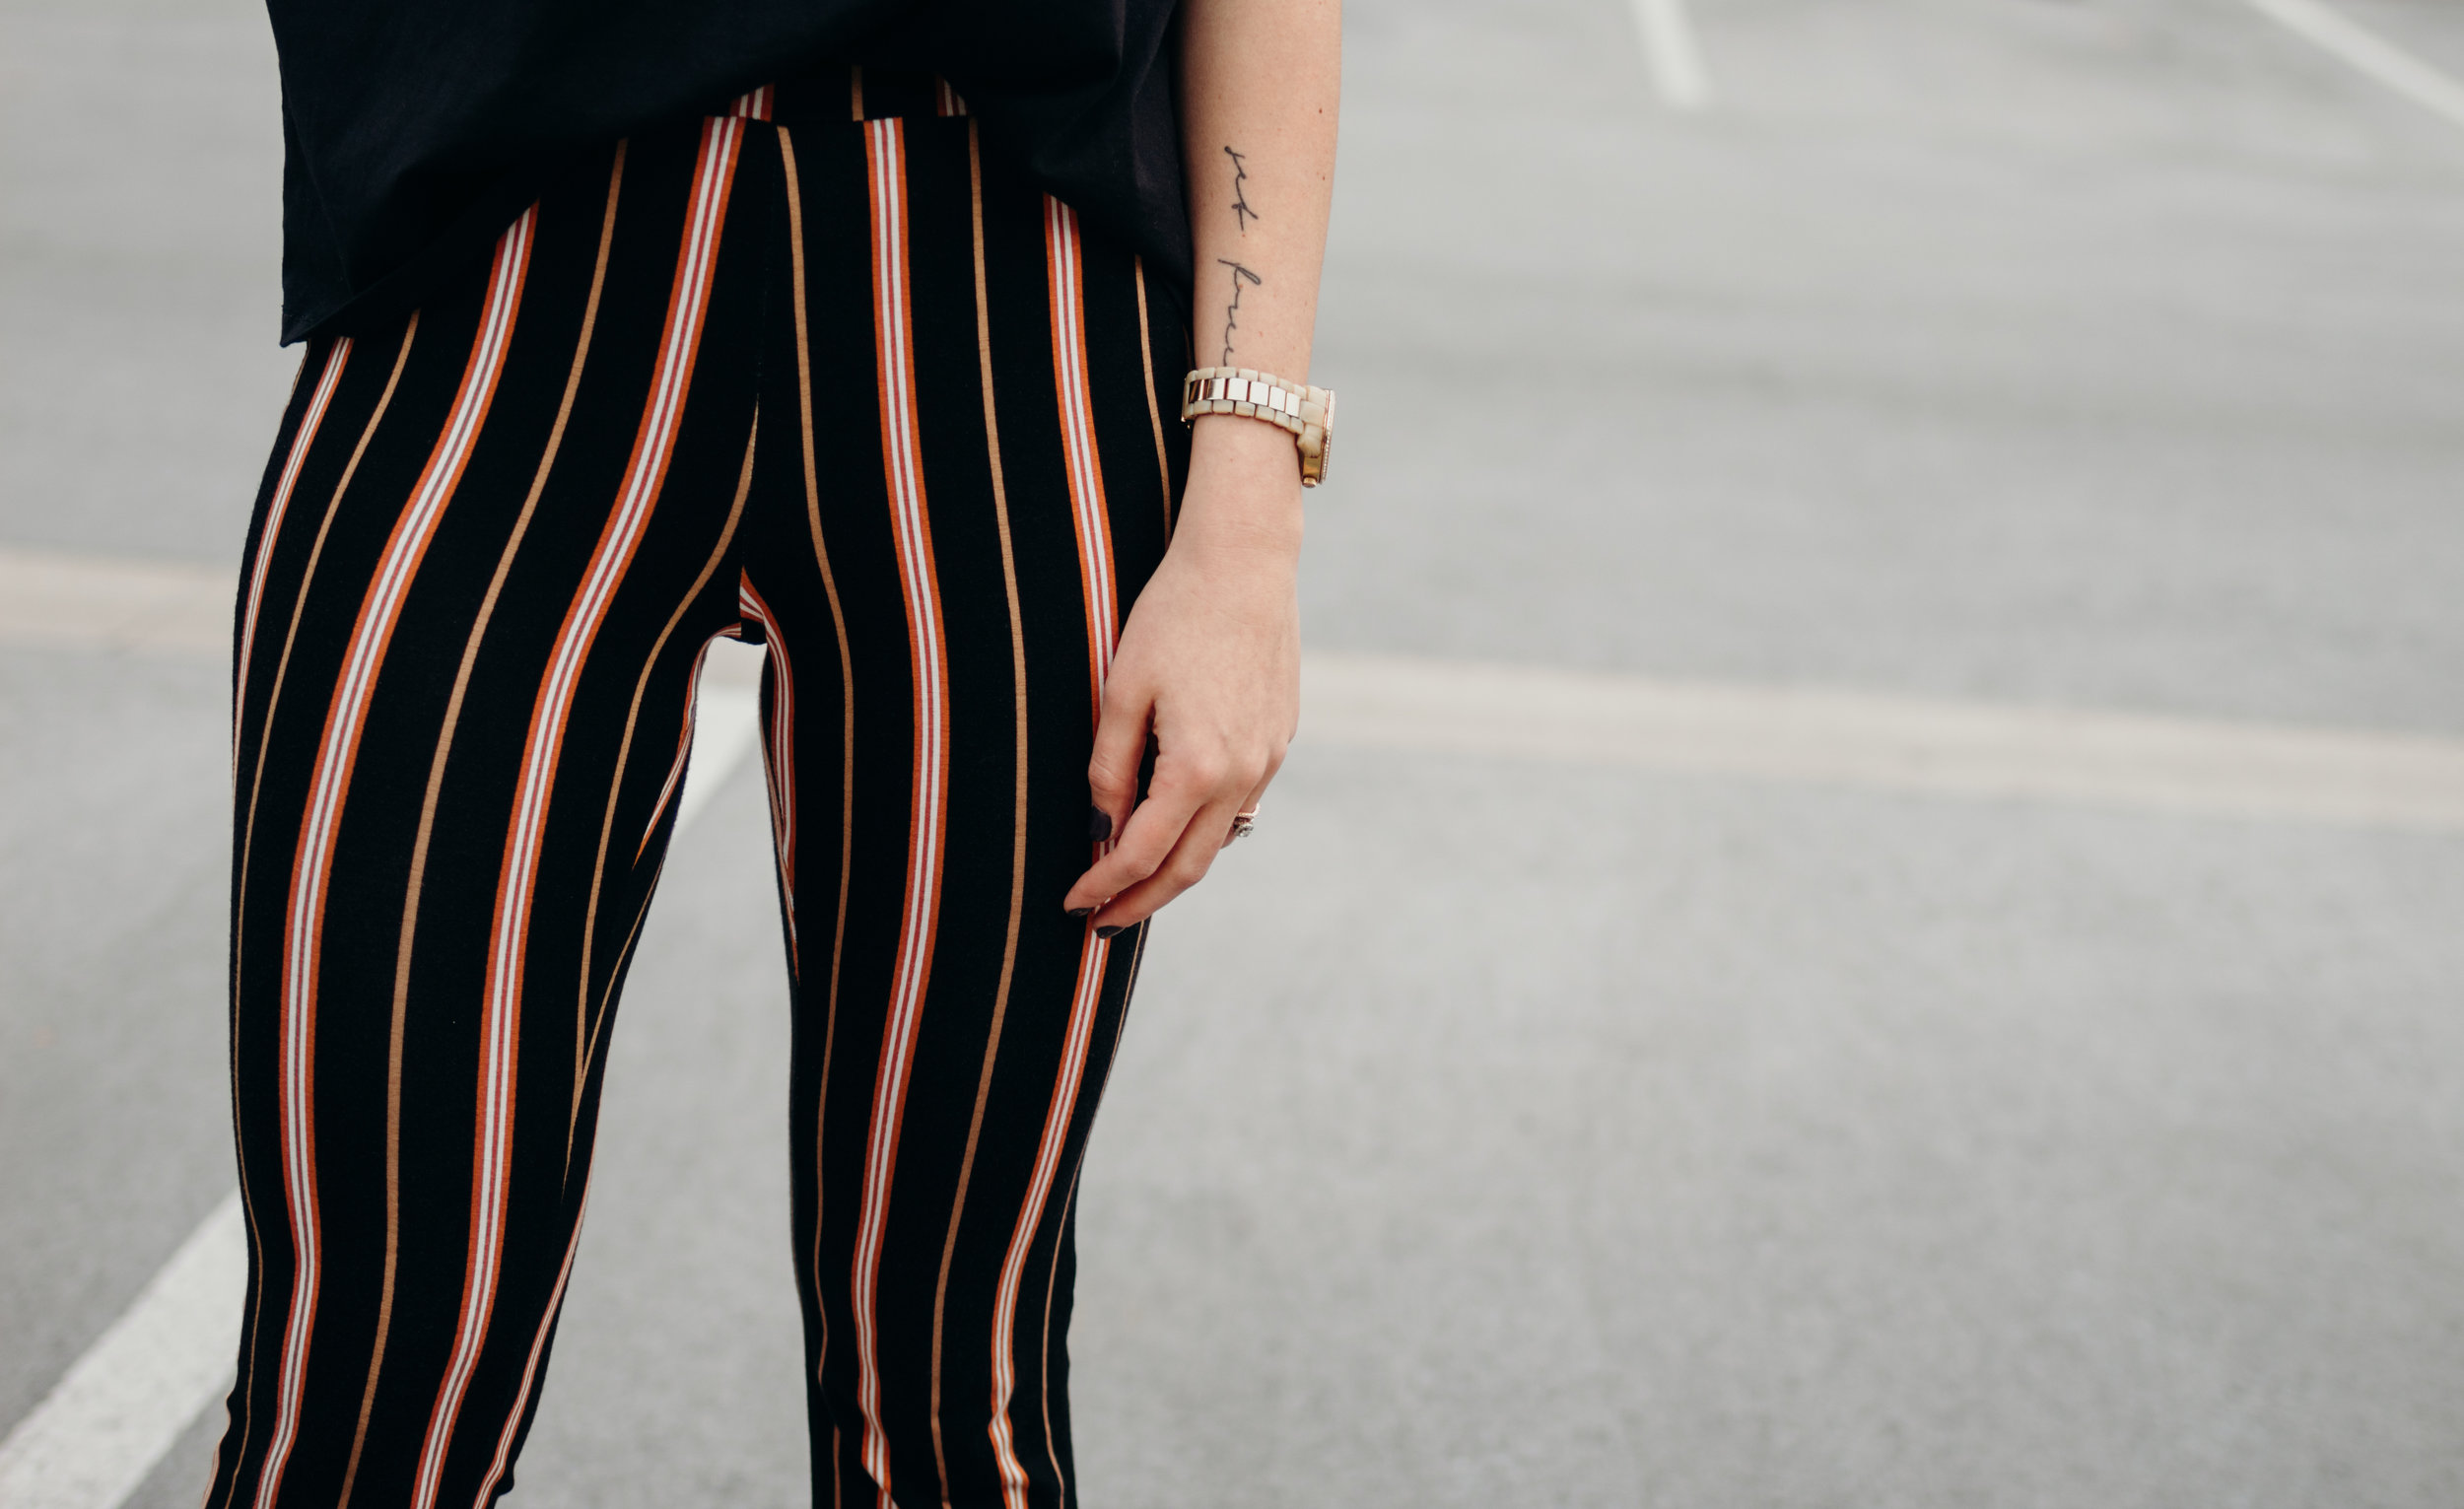 Striped Crop Pants | The Simplistic Chic